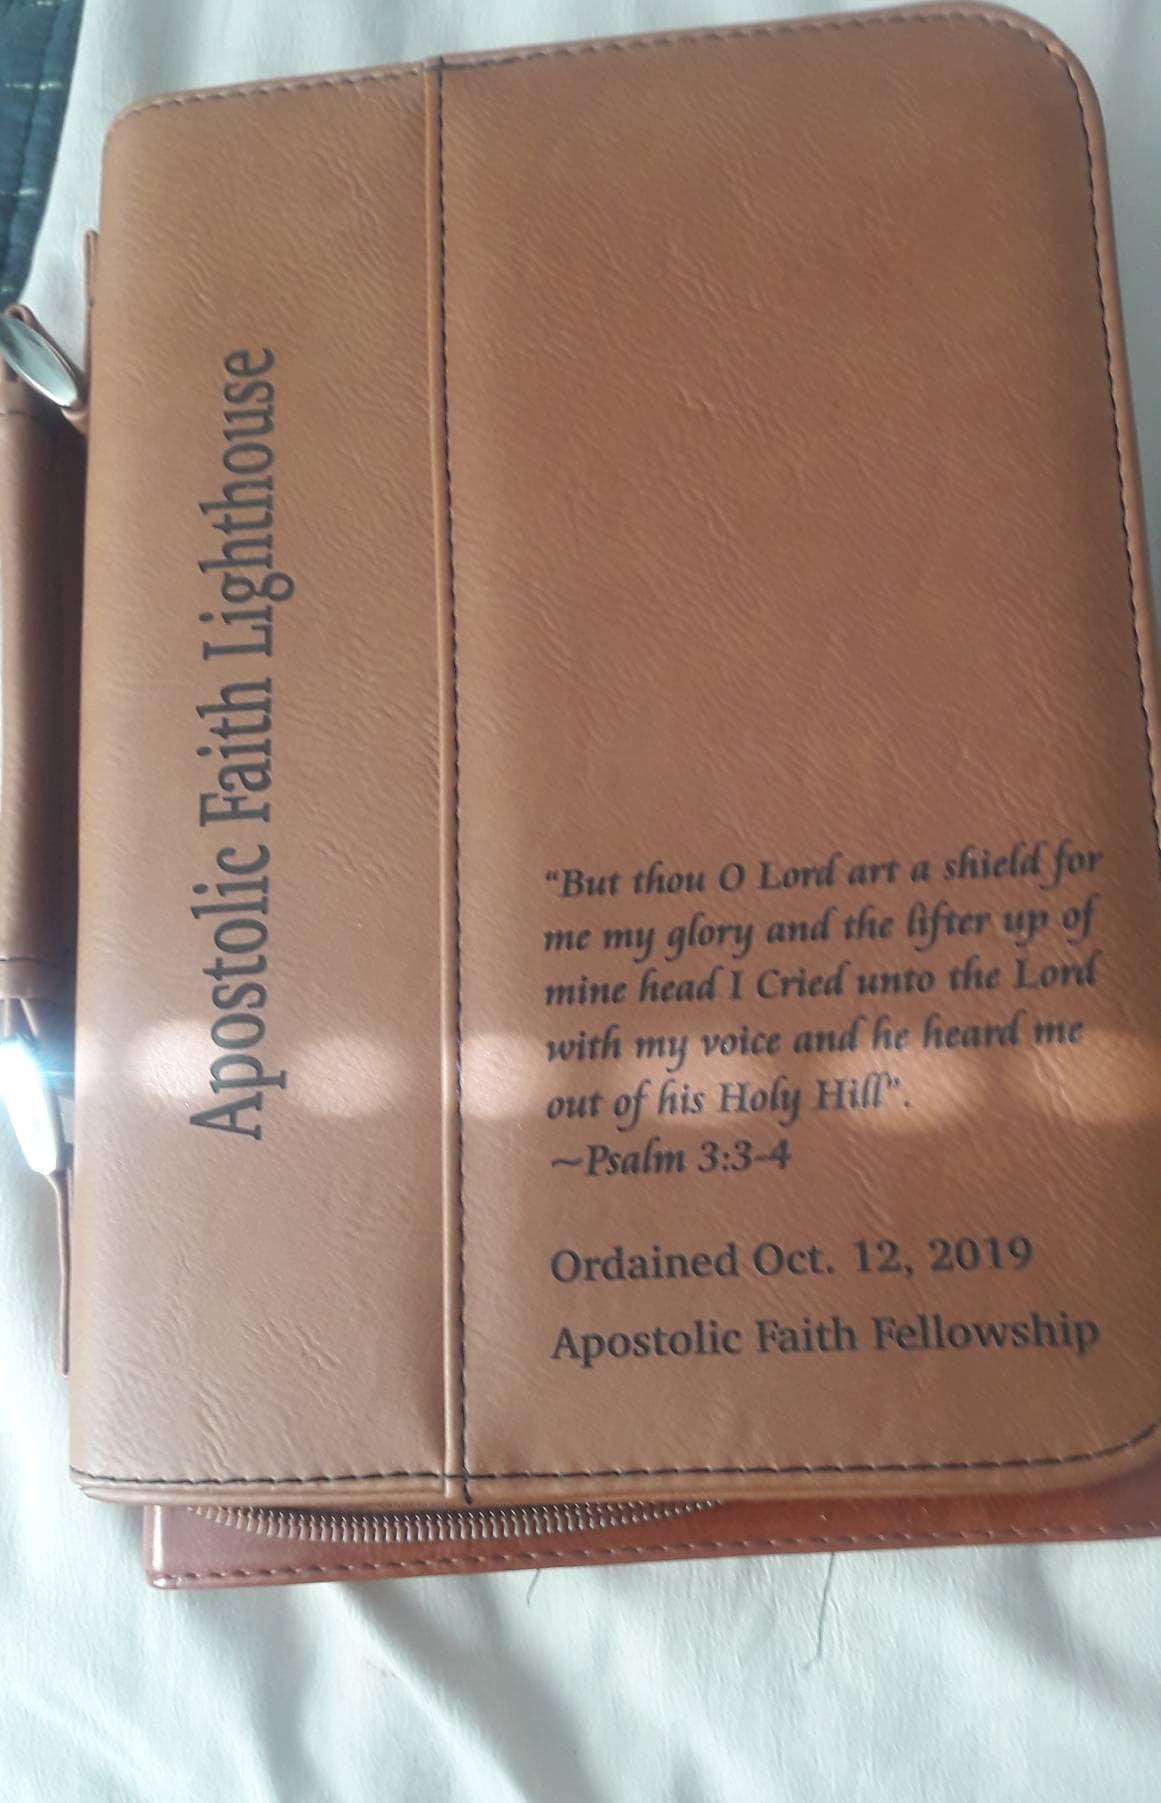 Apostolic Faithlighthouse added a photo of their purchase